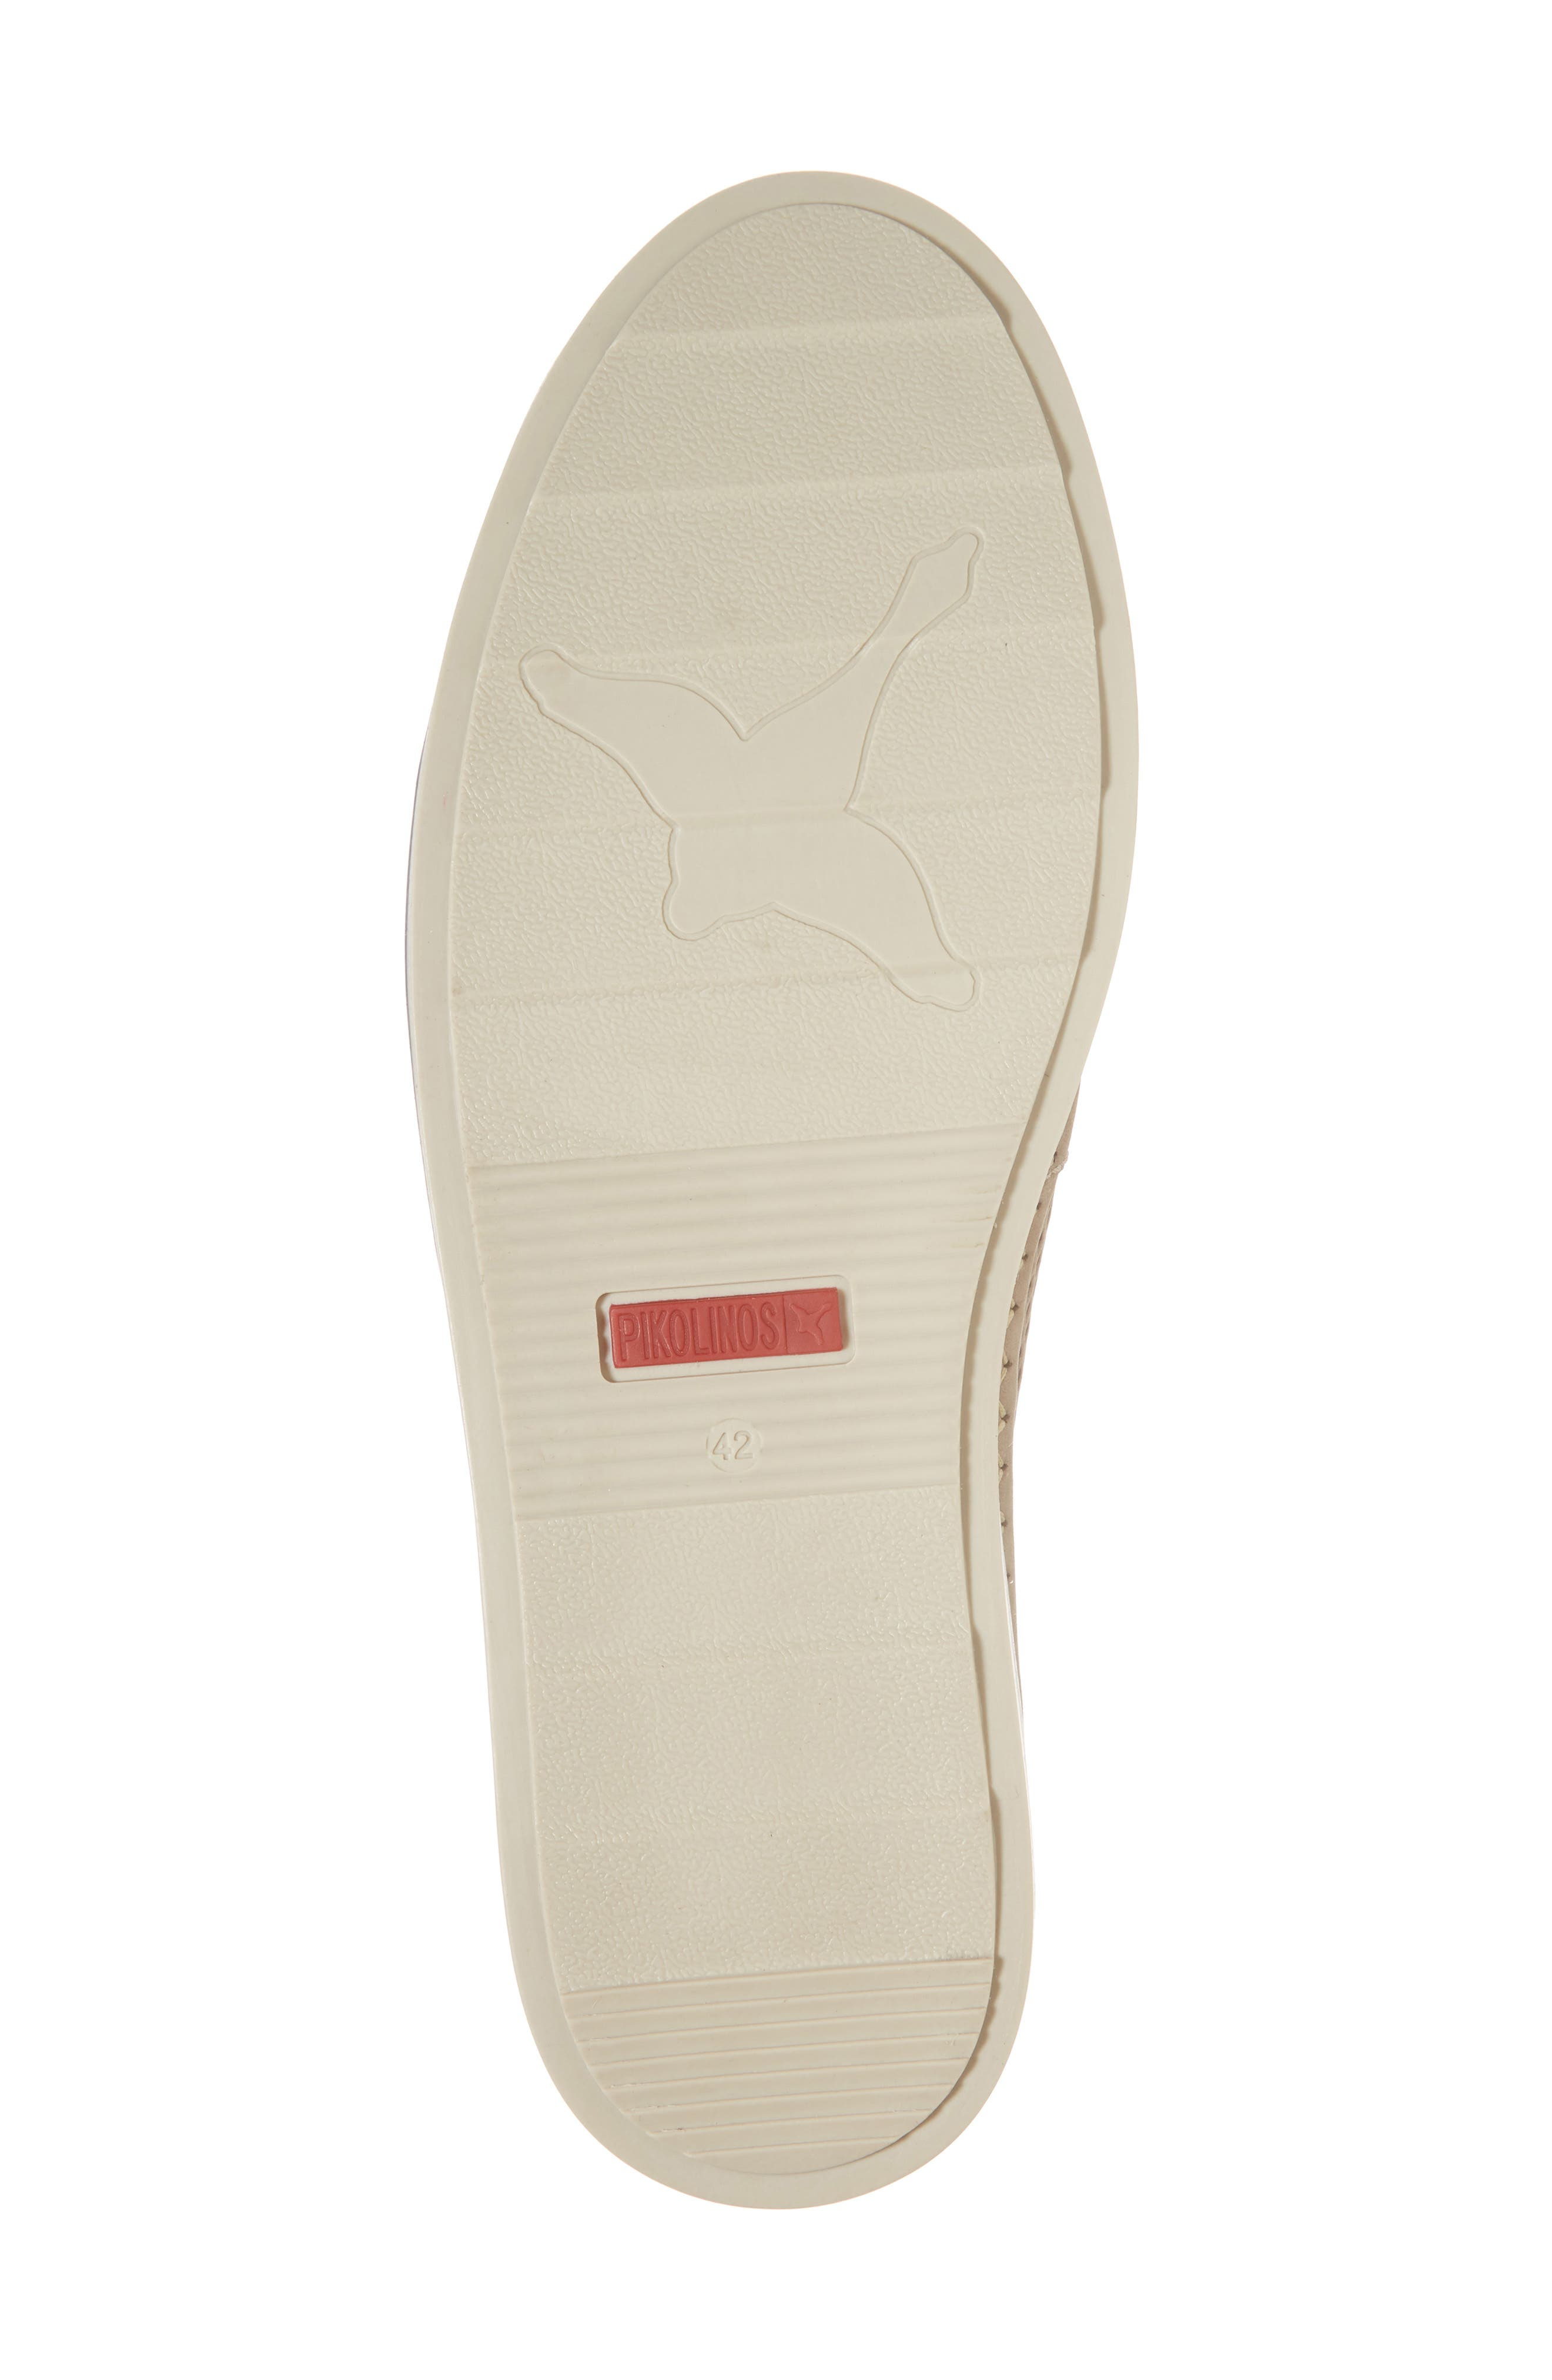 Linares Slip-On Loafer,                             Alternate thumbnail 6, color,                             250